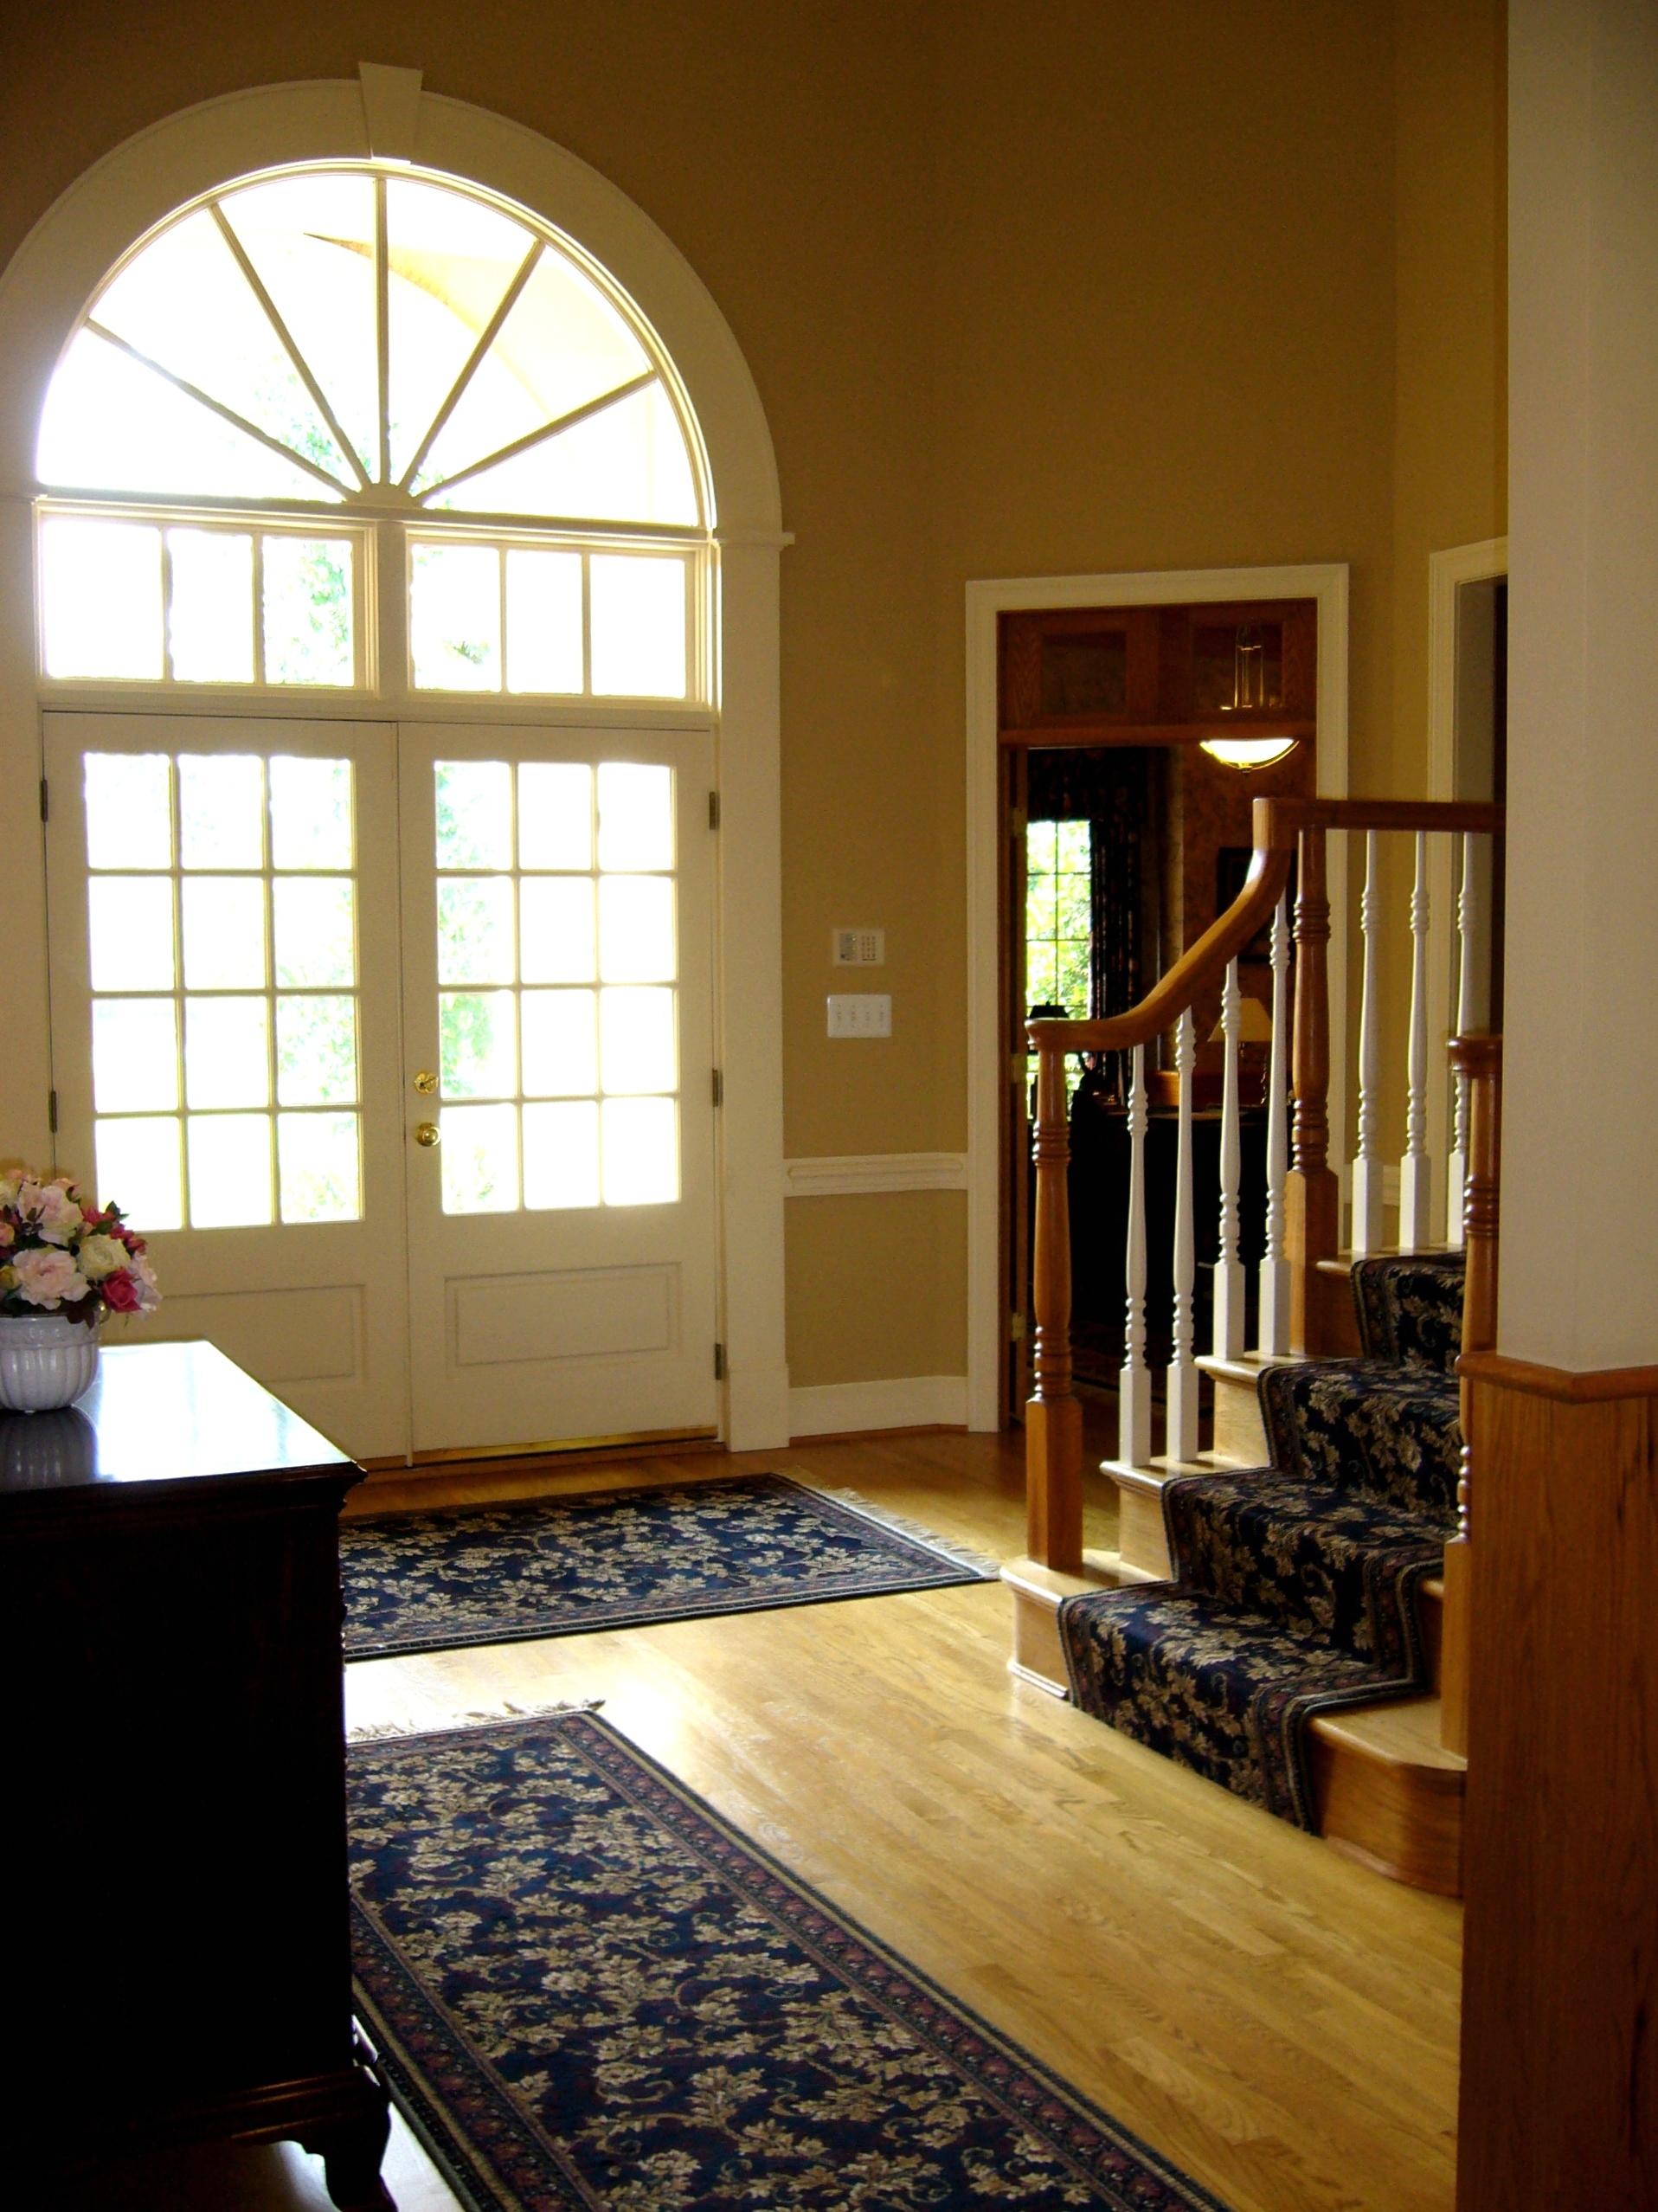 Foyer Wallpaper Images : Wallpaper for foyer area wallpapersafari